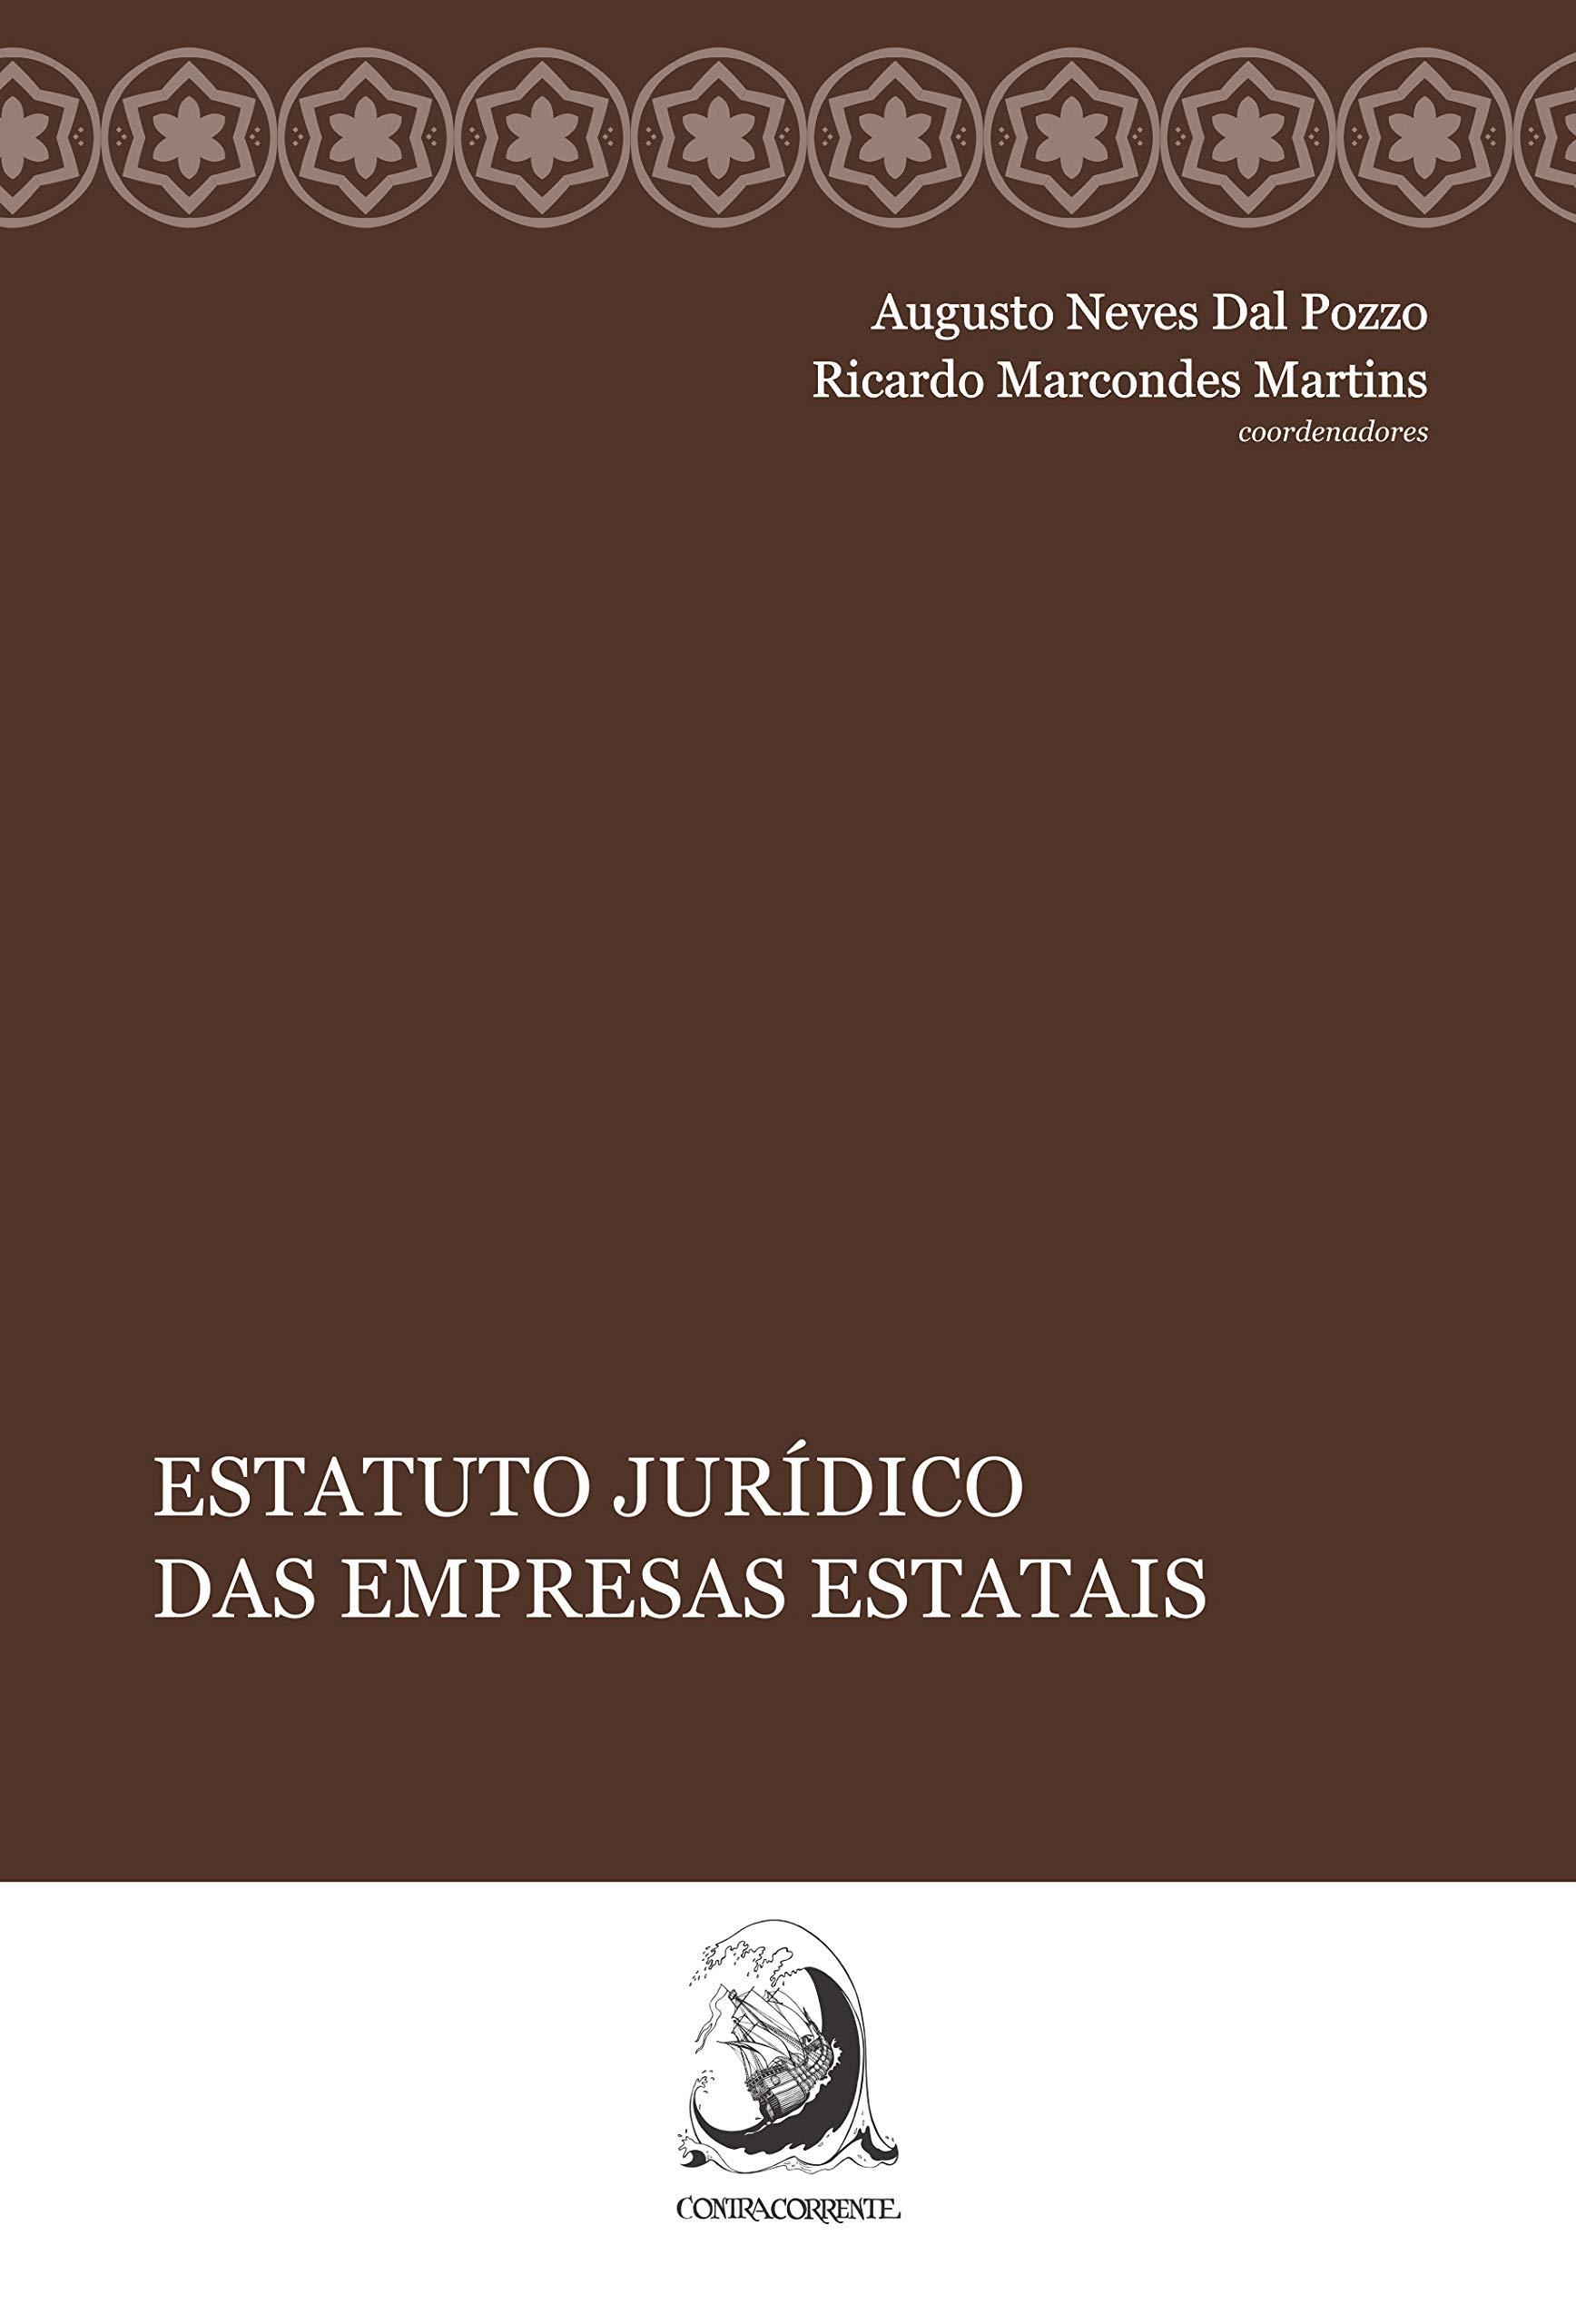 Estatuto jurídico das empresas estatais, livro de Augusto Neves Dal Pozzo, Ricardo Marcondes Martins (orgs.)